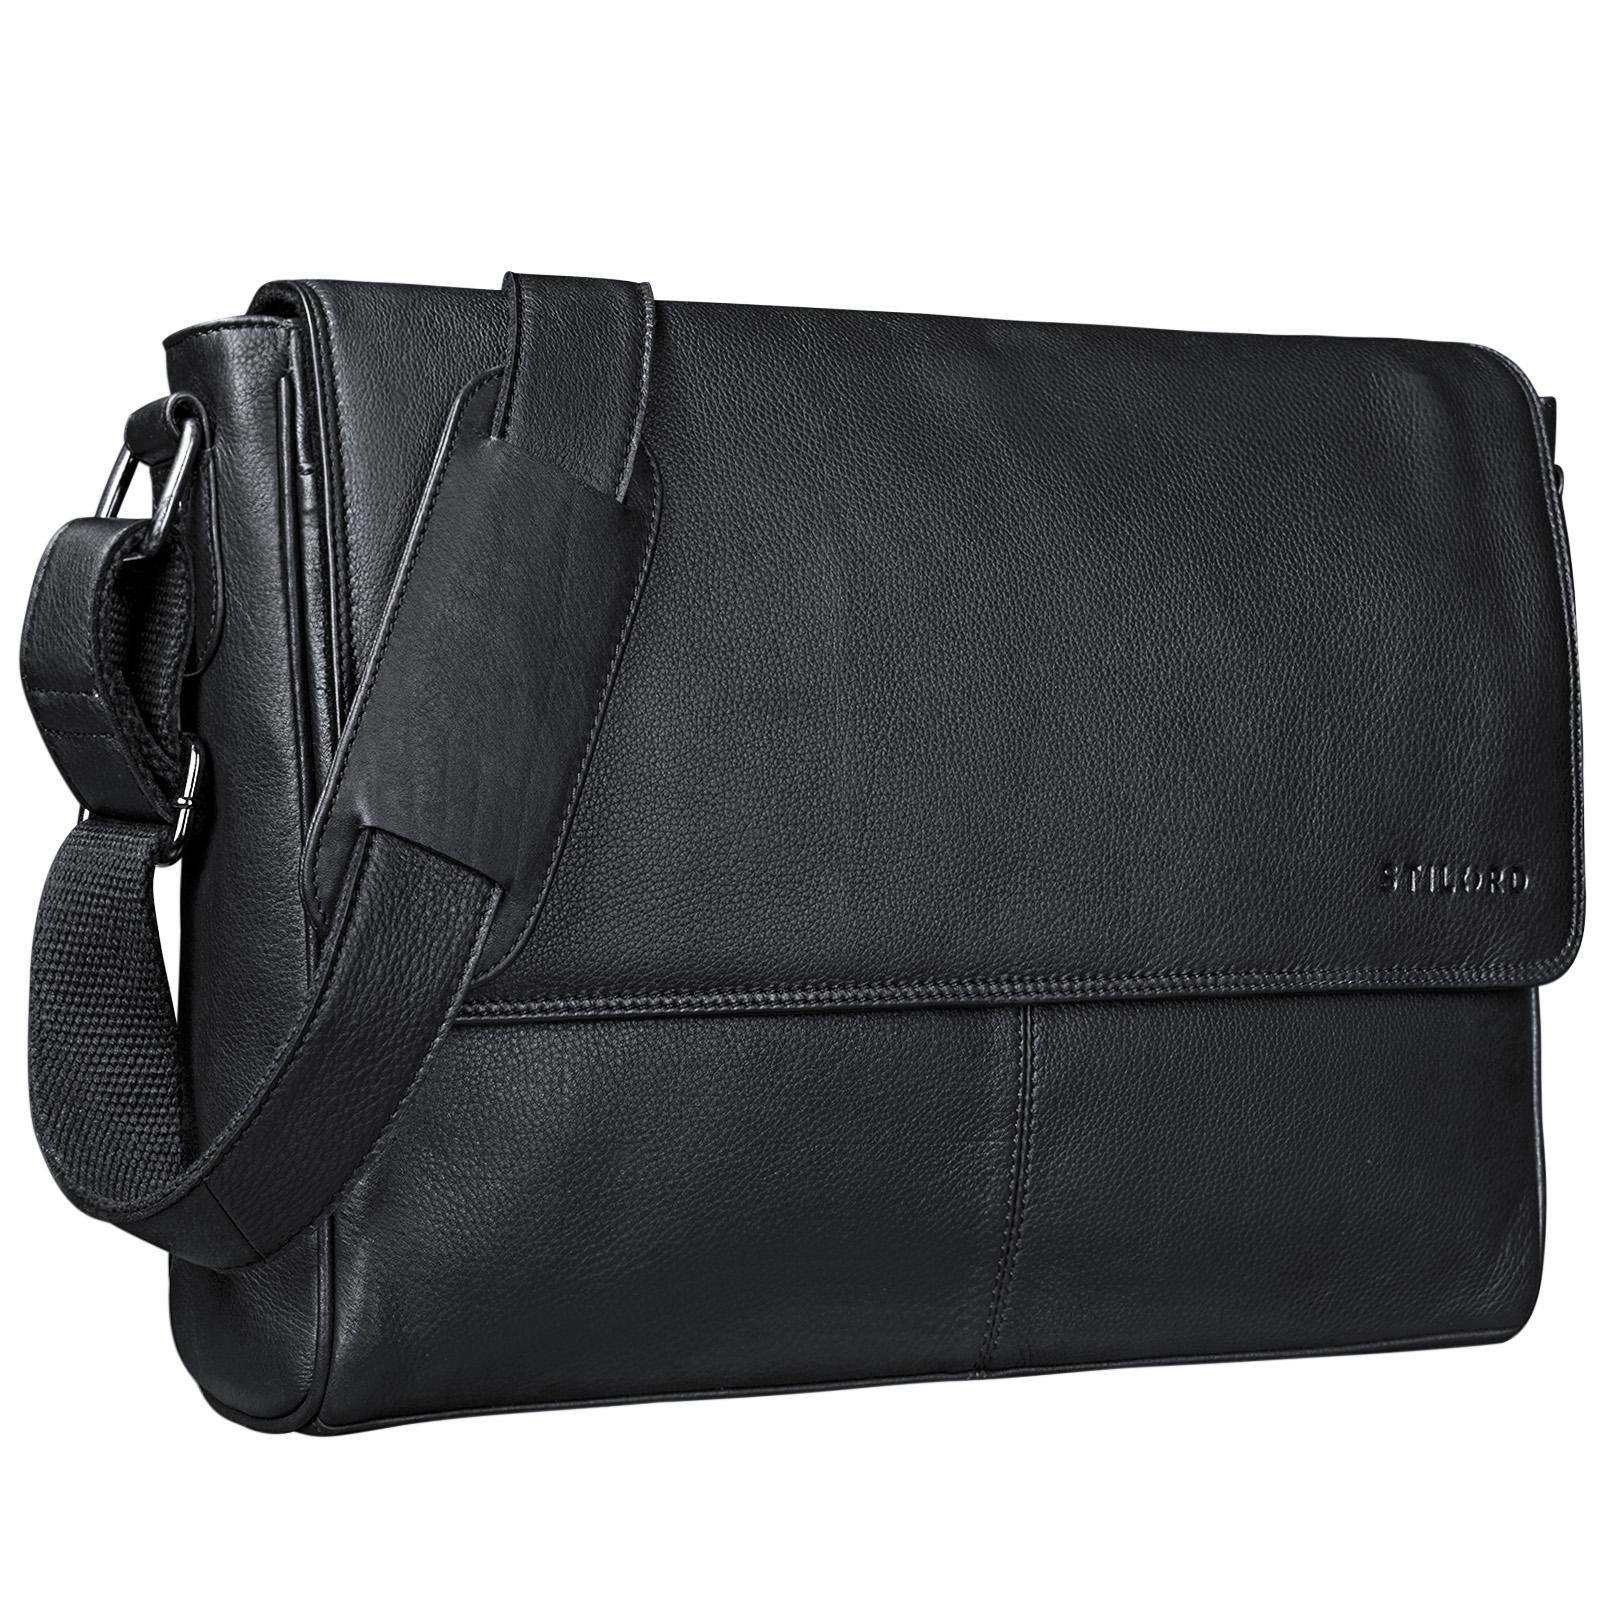 "STILORD ""Oskar"" Umhängetasche aus echtem Rinds-Leder Unisex Messenger Bag Business Unitasche Bürotasche Leder  - Bild 15"